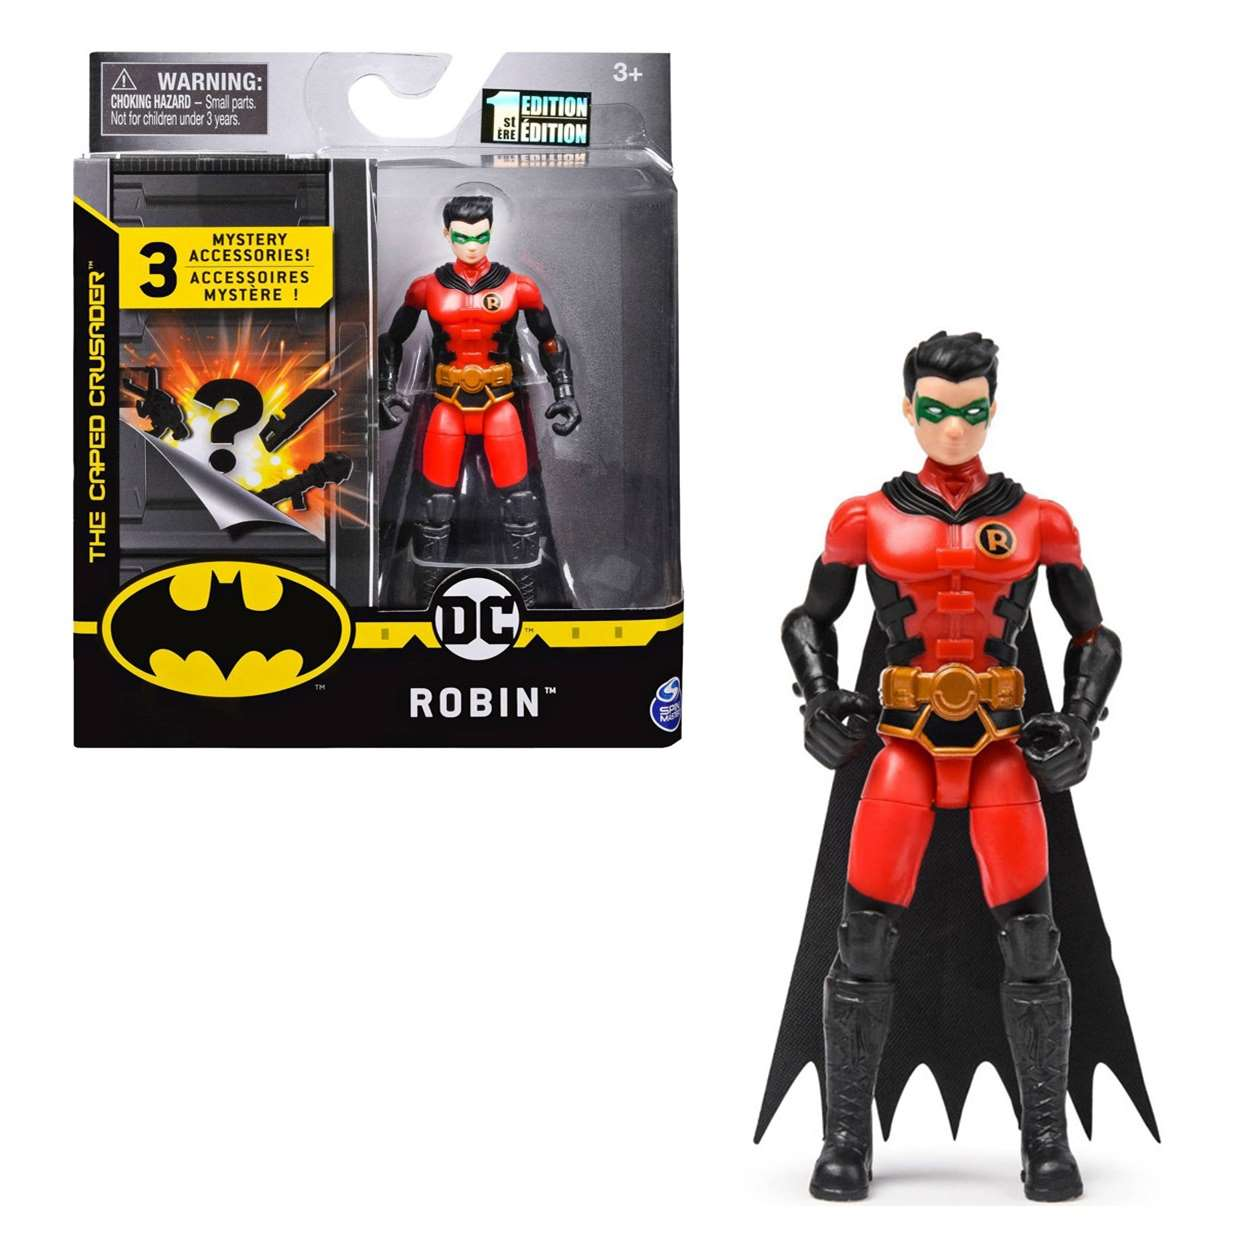 Robin 1er Edition Figura Batman The Caped Crusader 3 PuLG